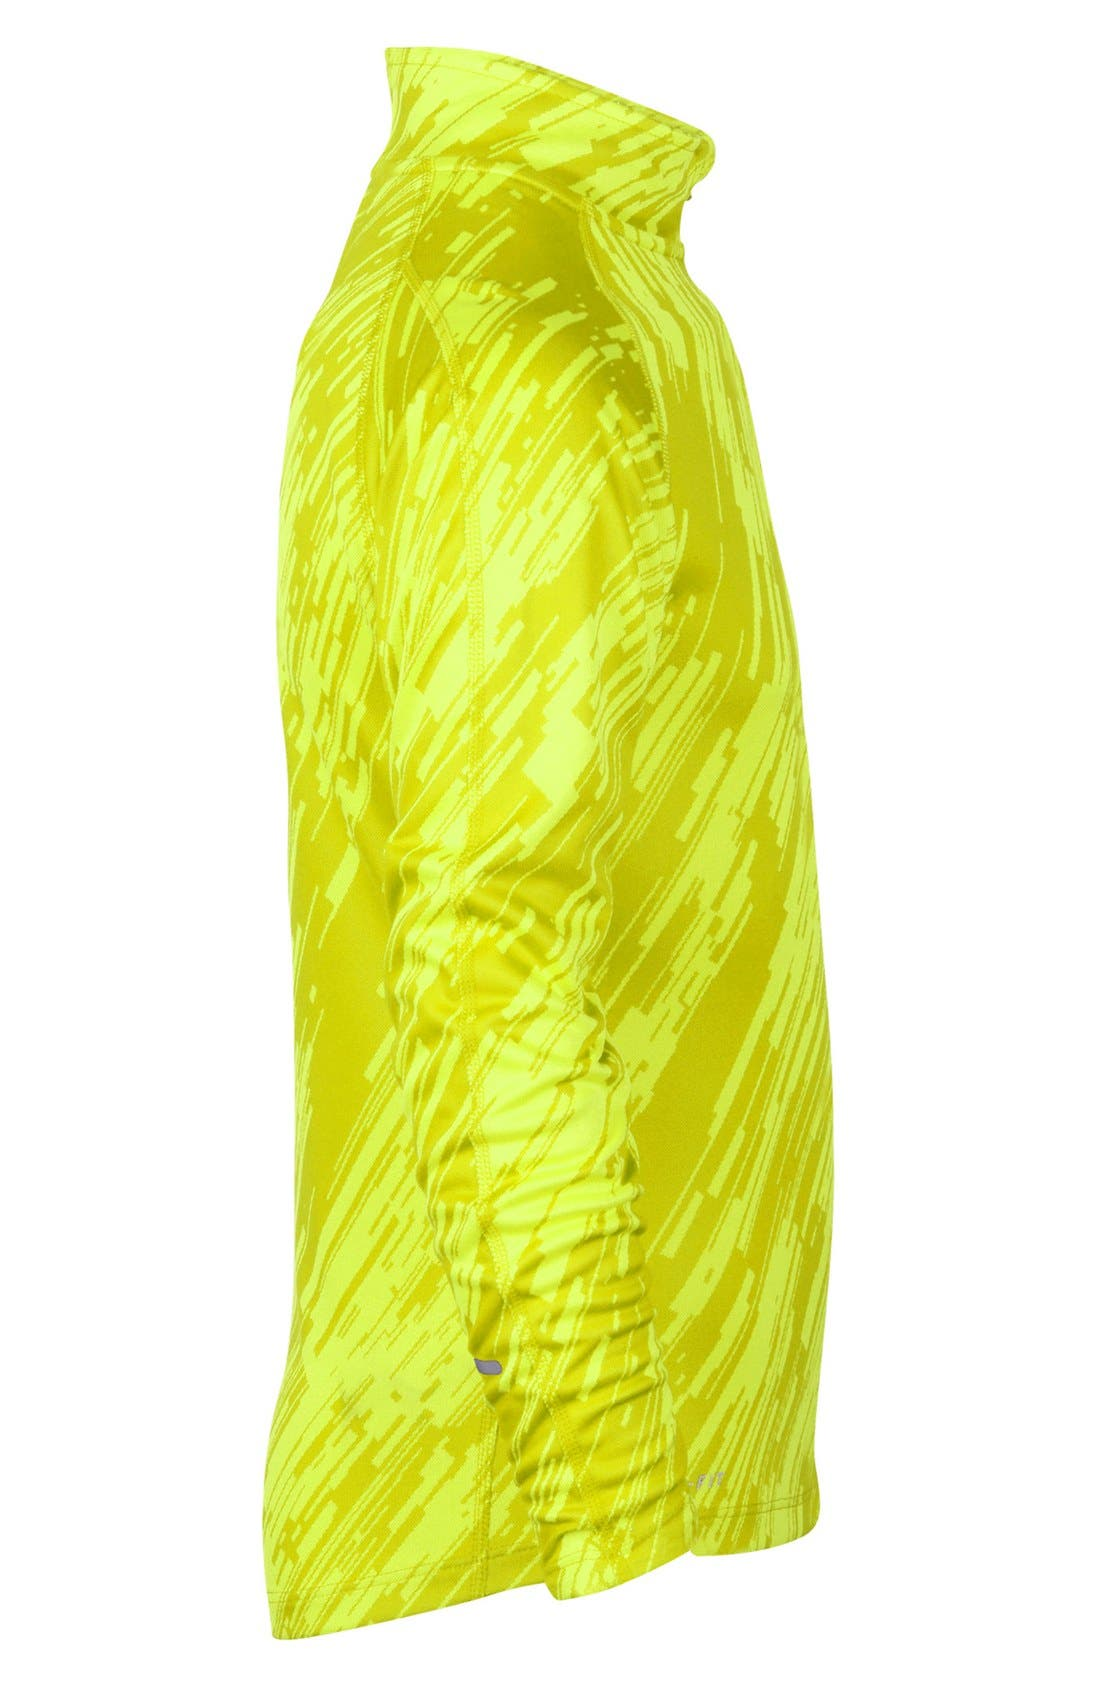 Alternate Image 3  - Nike 'Element' Jacquard Half Zip Running Top (Big Boys)